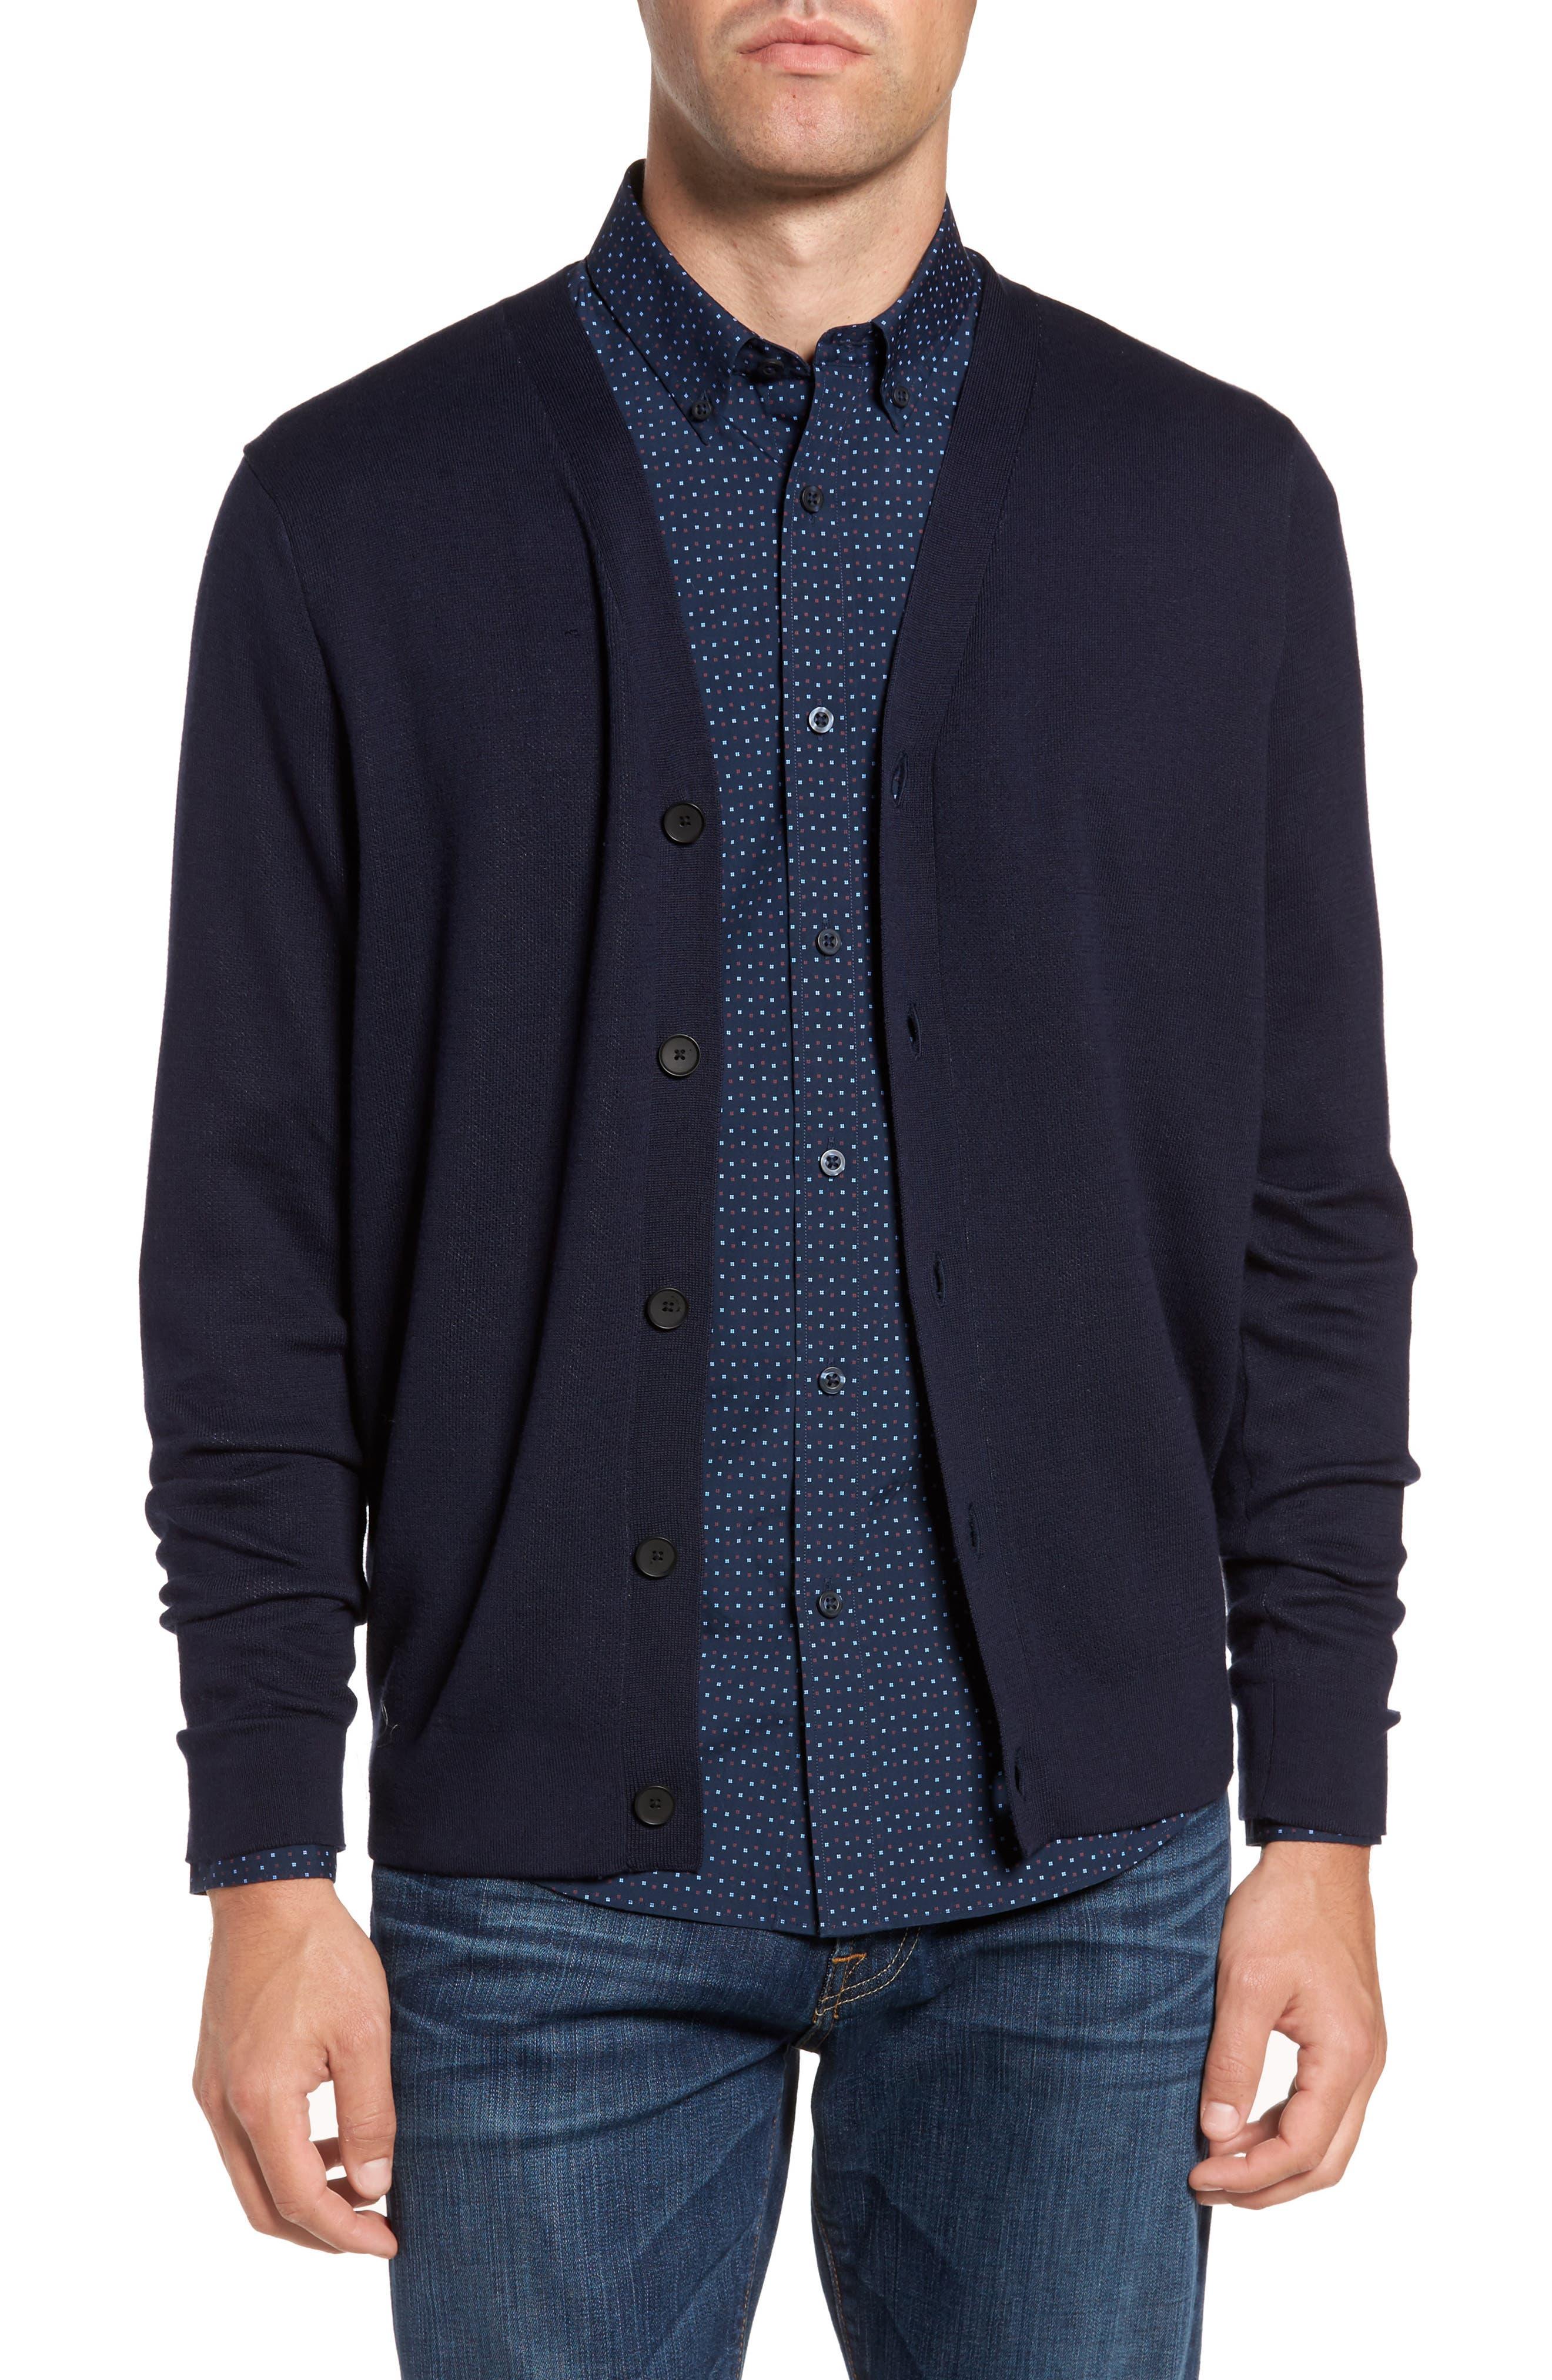 Main Image - Nordstrom Men's Shop Pima Cotton Blend Cardigan